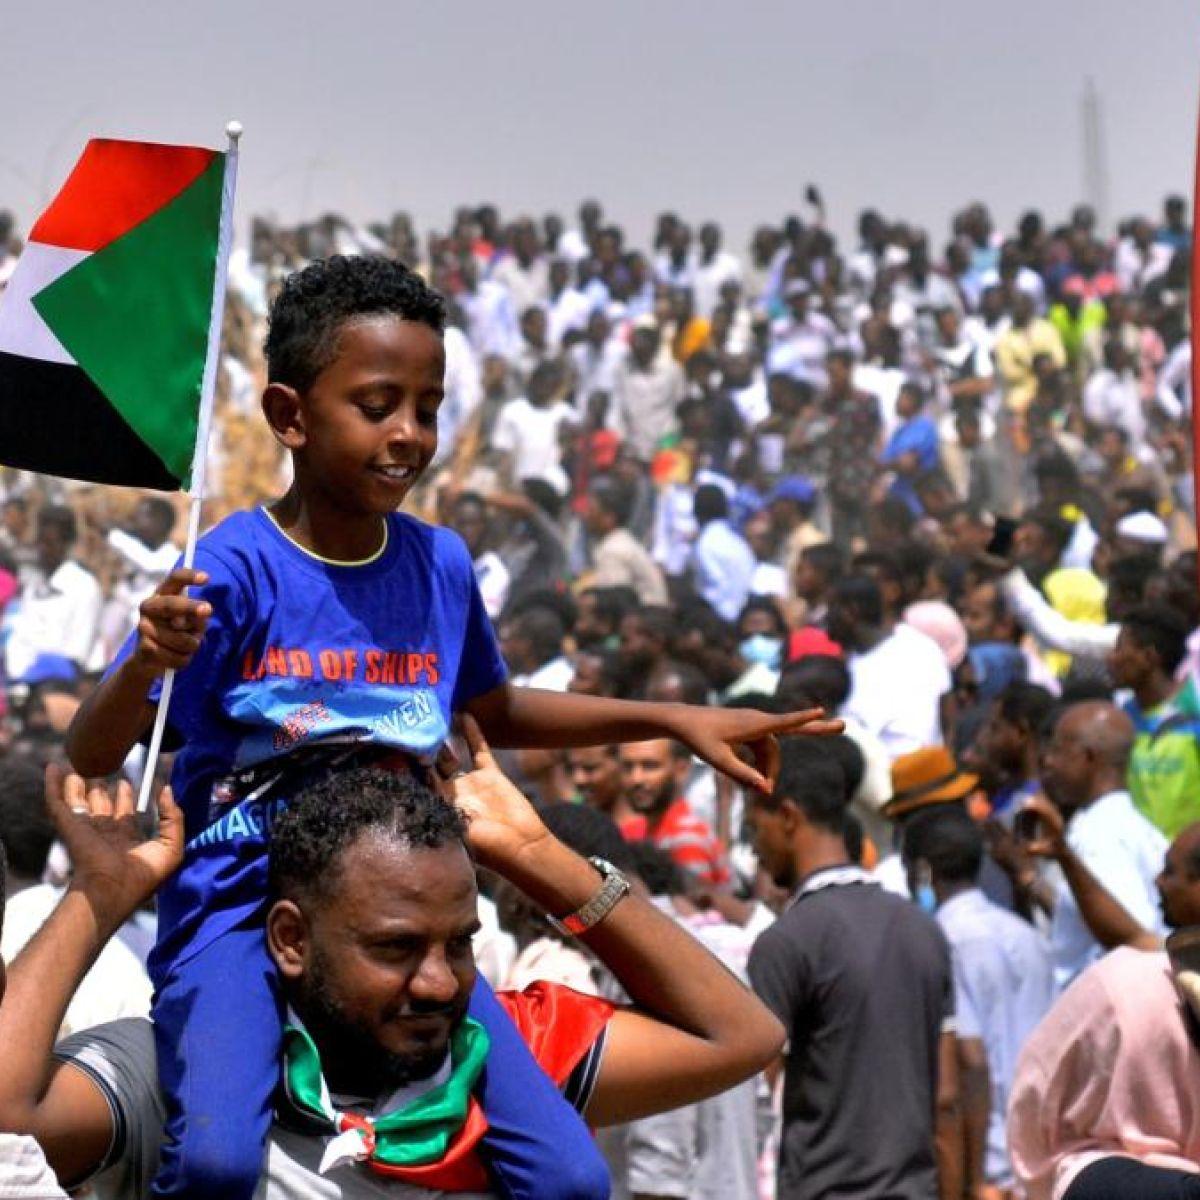 Sudanese president Omar al-Bashir deposed by army after 30 years